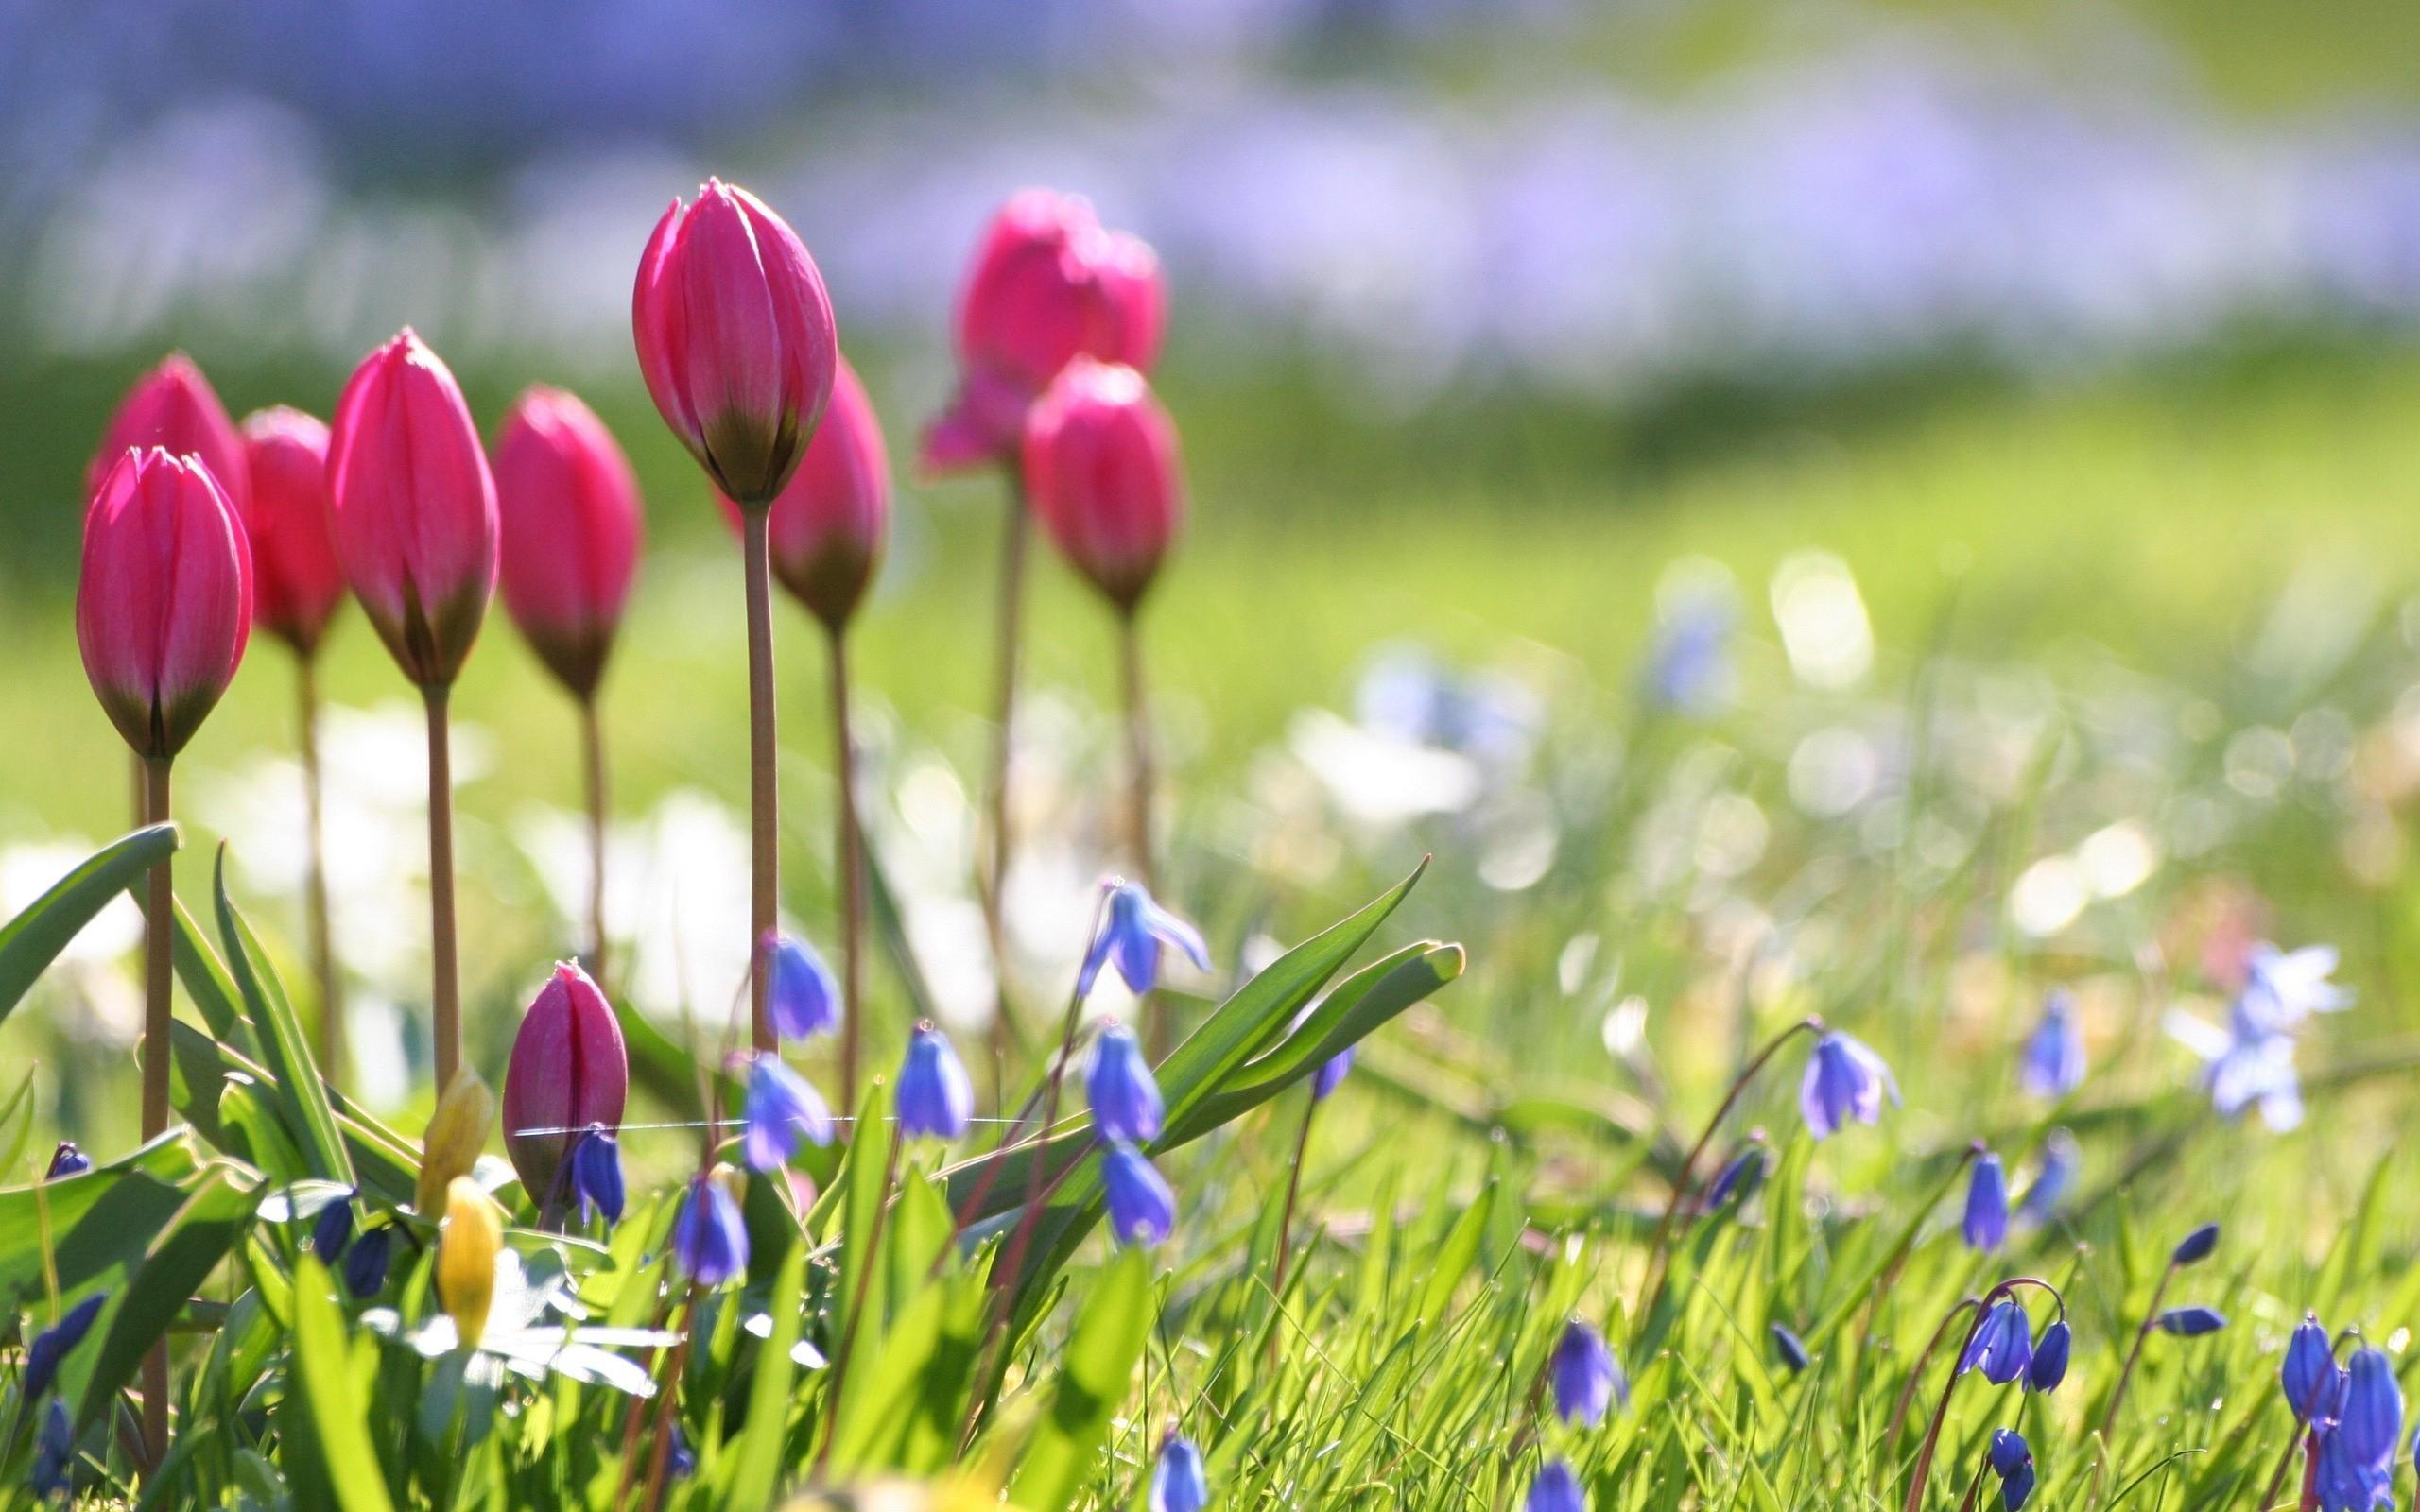 10 Most Popular Spring Flower Wallpaper Backgrounds Full Hd 1920